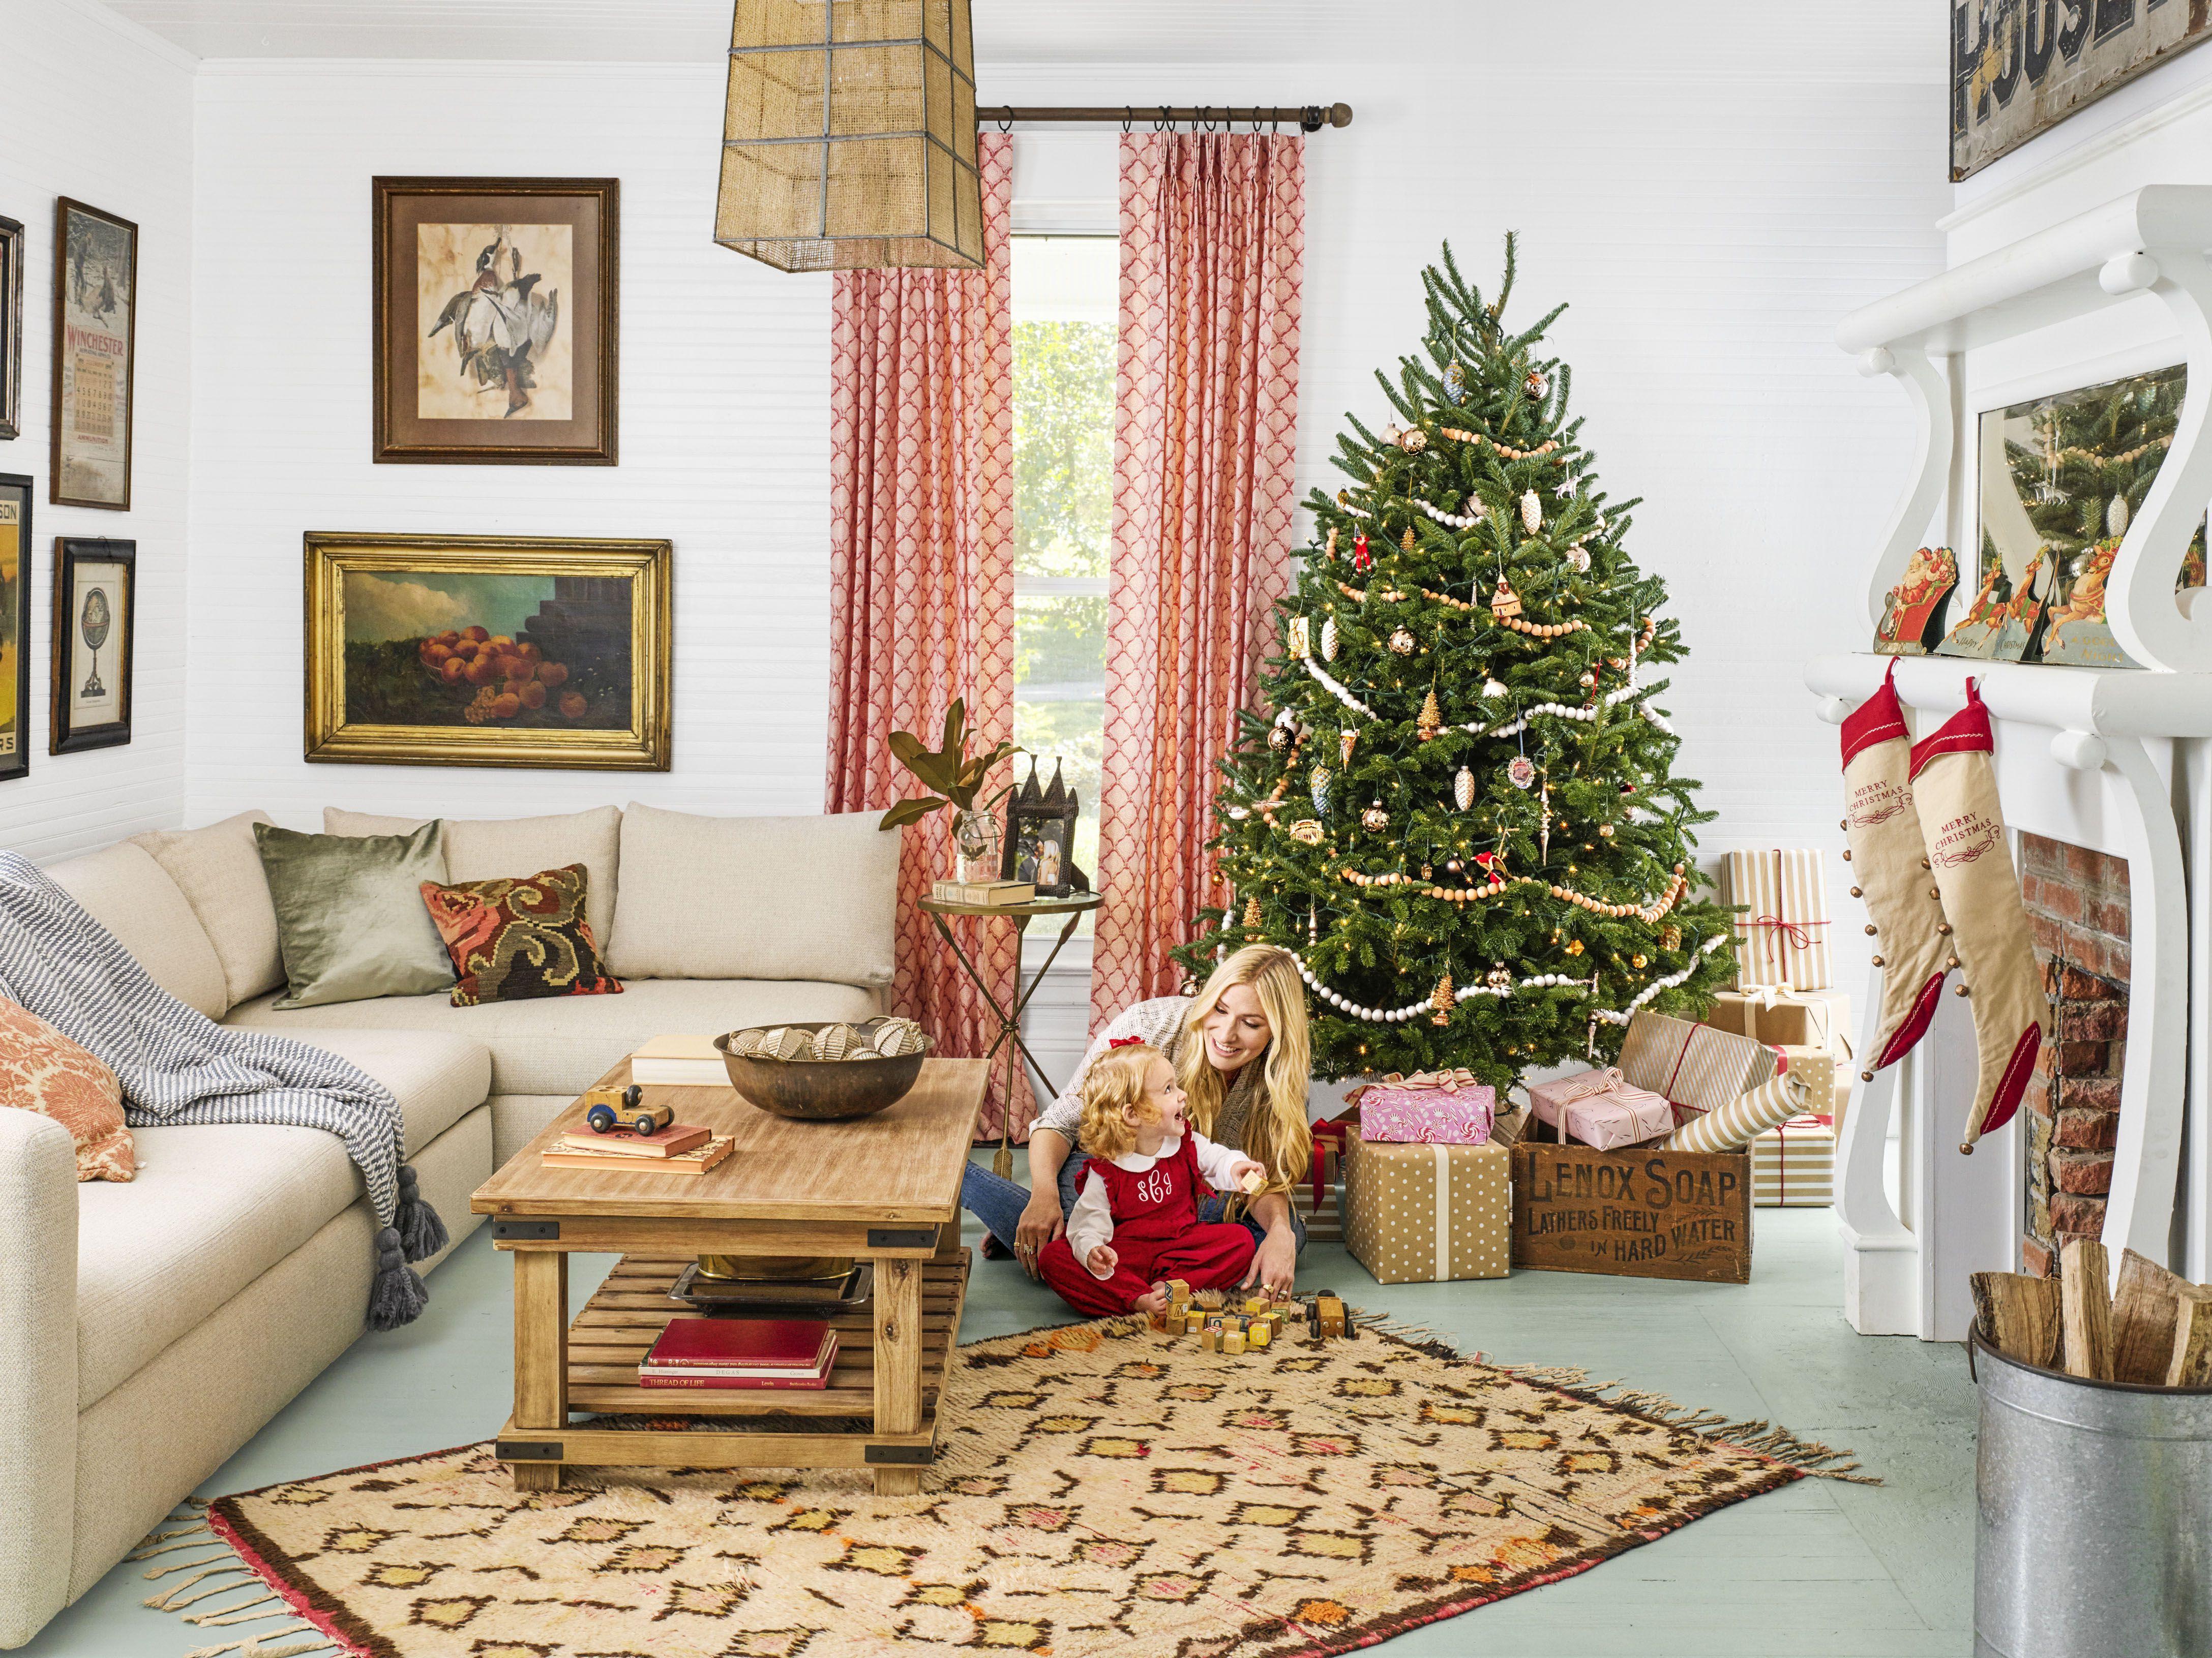 Design For Christmas Winter Holidays Family Tree House Cookies Rumah Gambar Small living room christmas